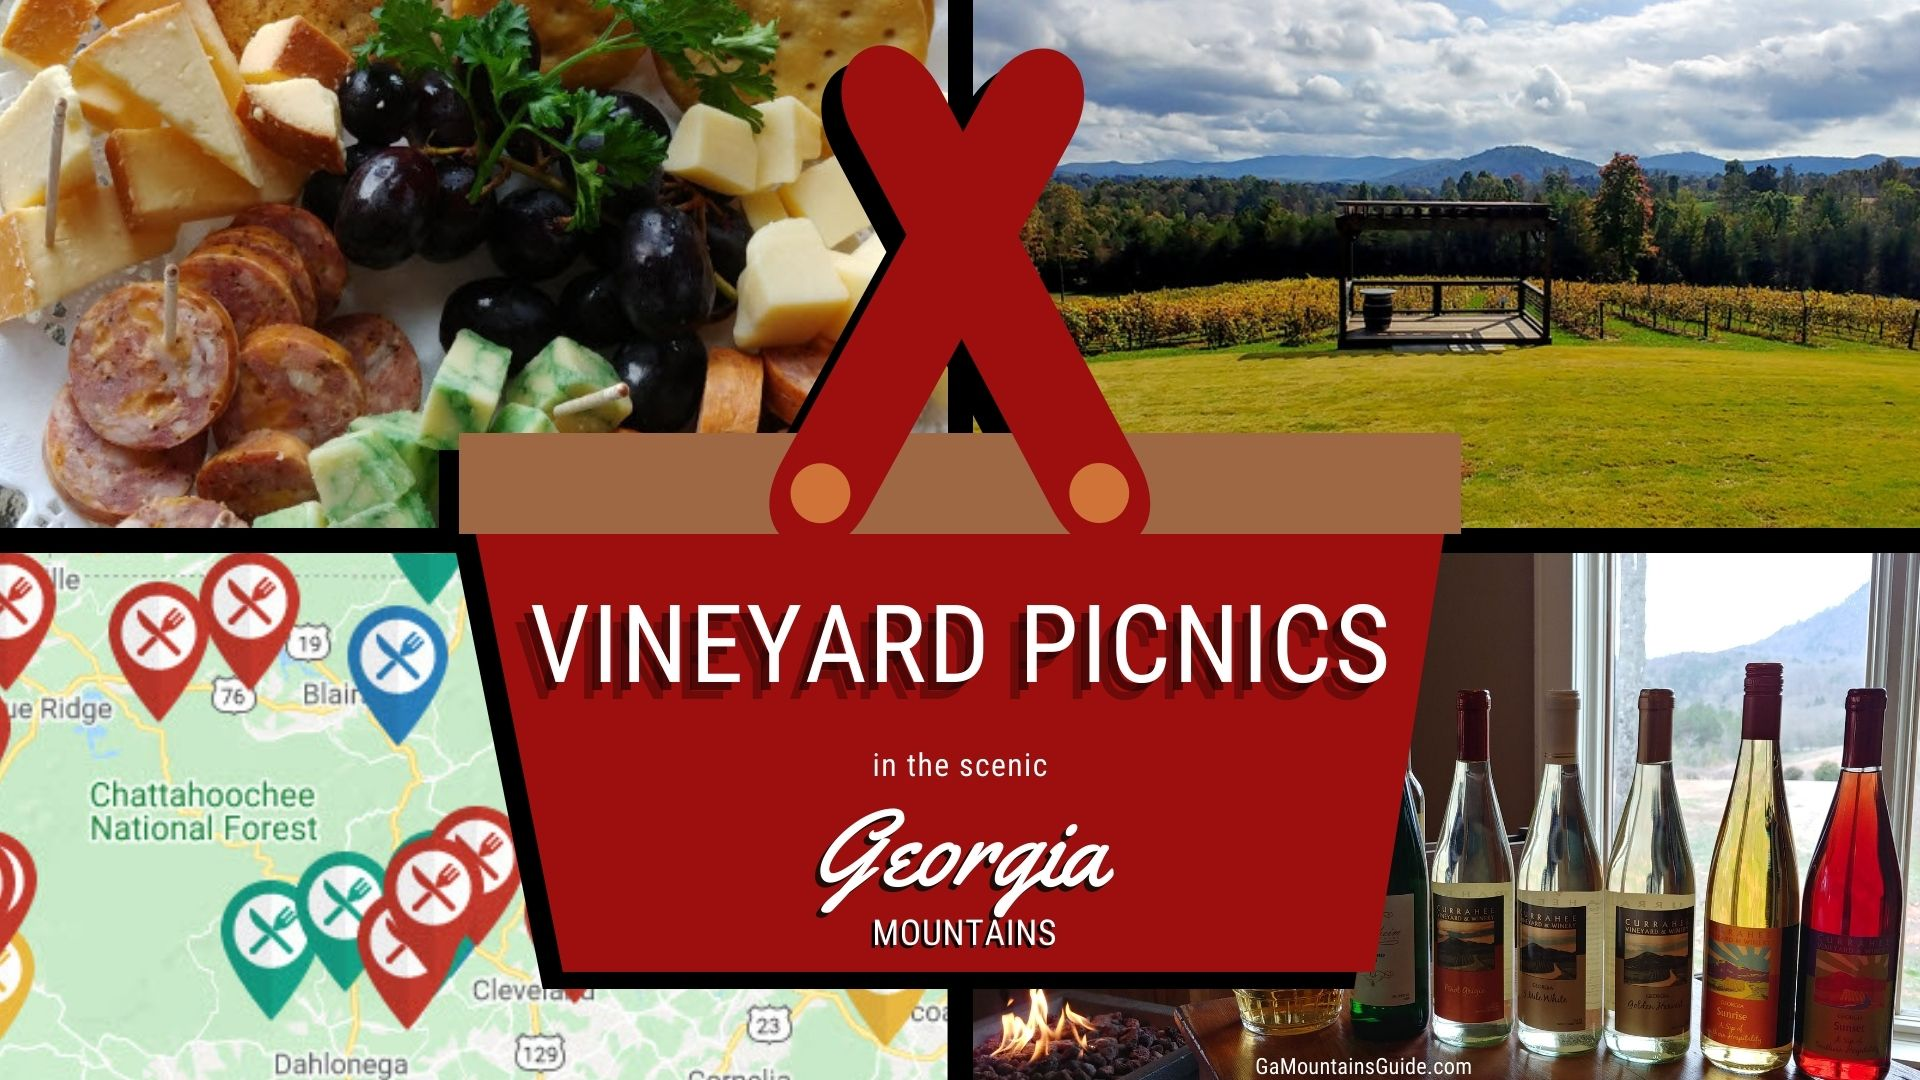 Vineyard-Mountain-Picnics-Georgia-Mtns